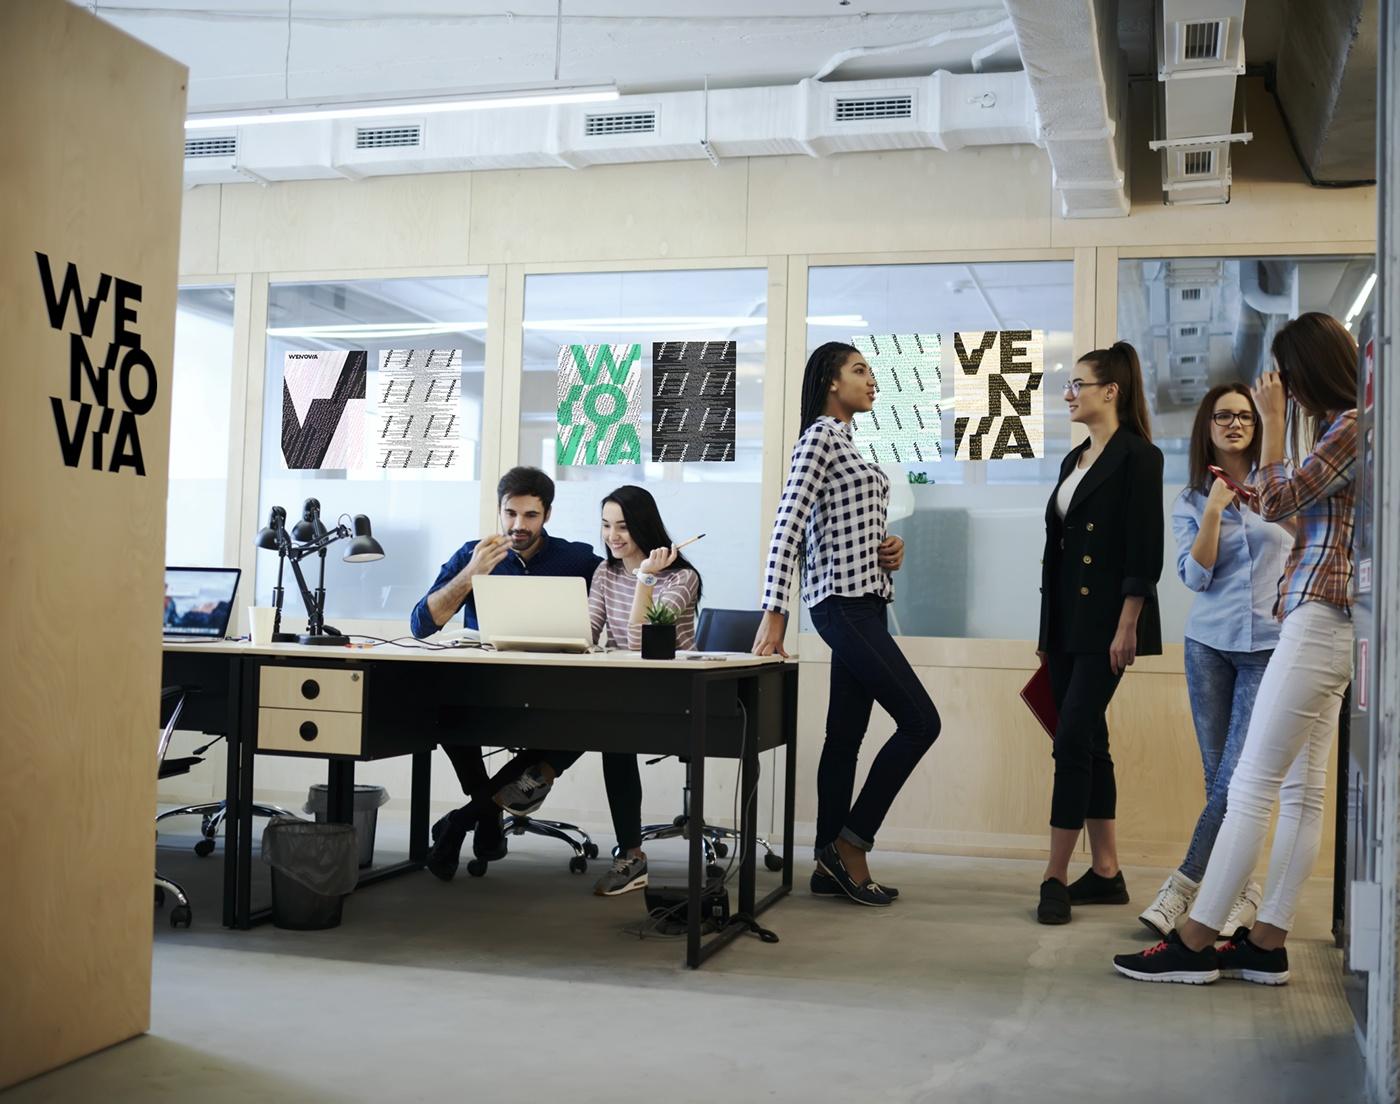 entrepreneurship   coworking Startup University school student cergy Paris france